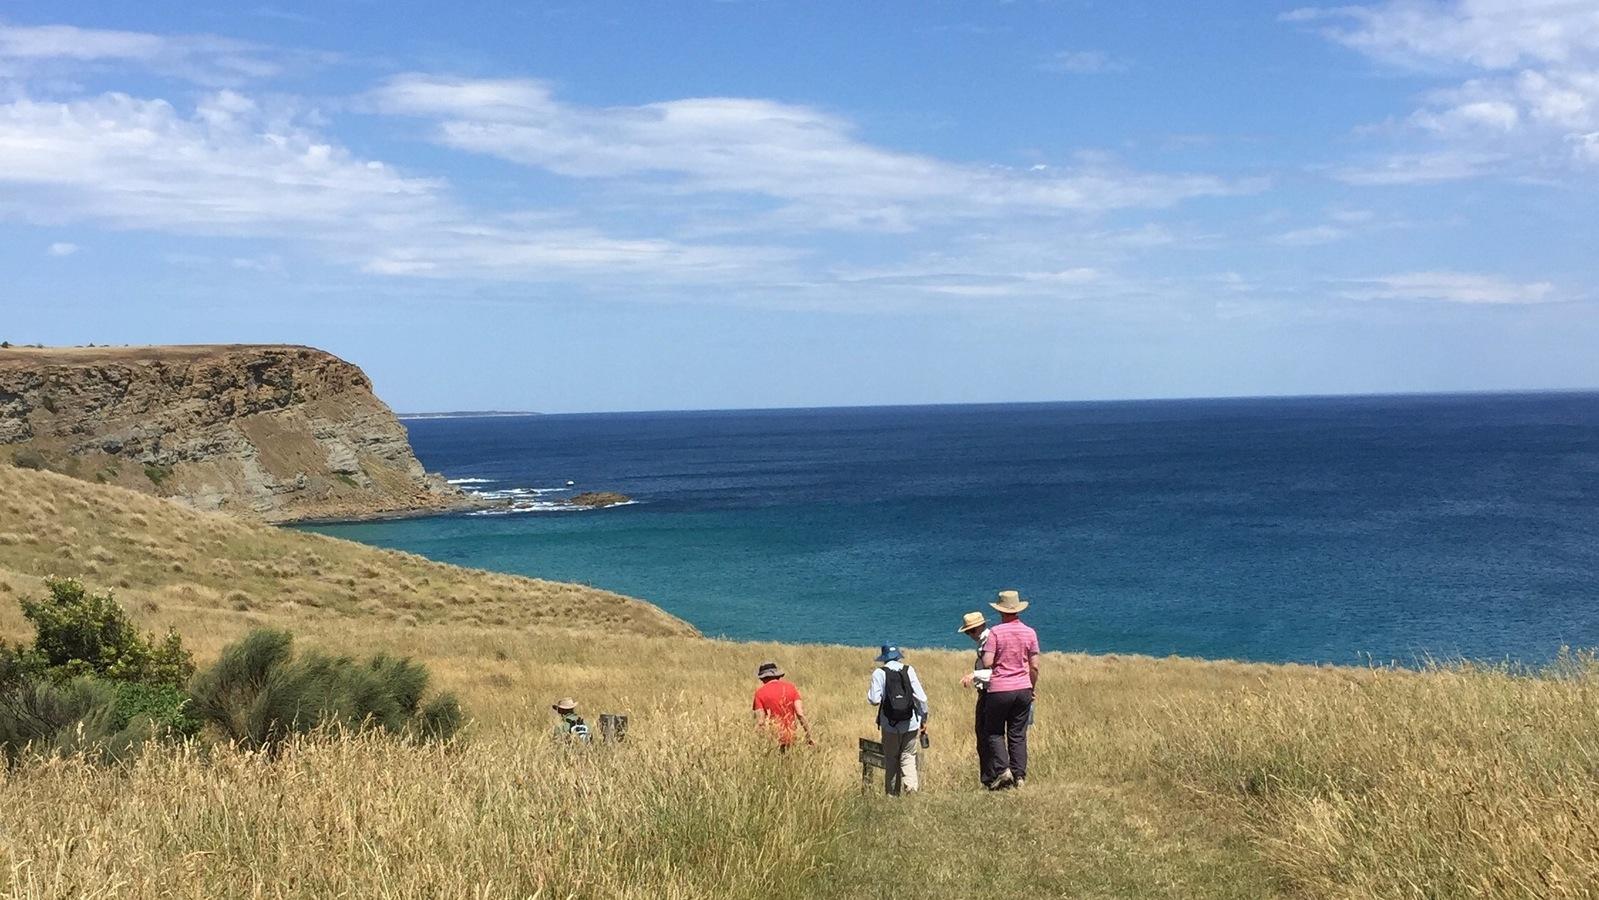 The George Bass Coastal Walk